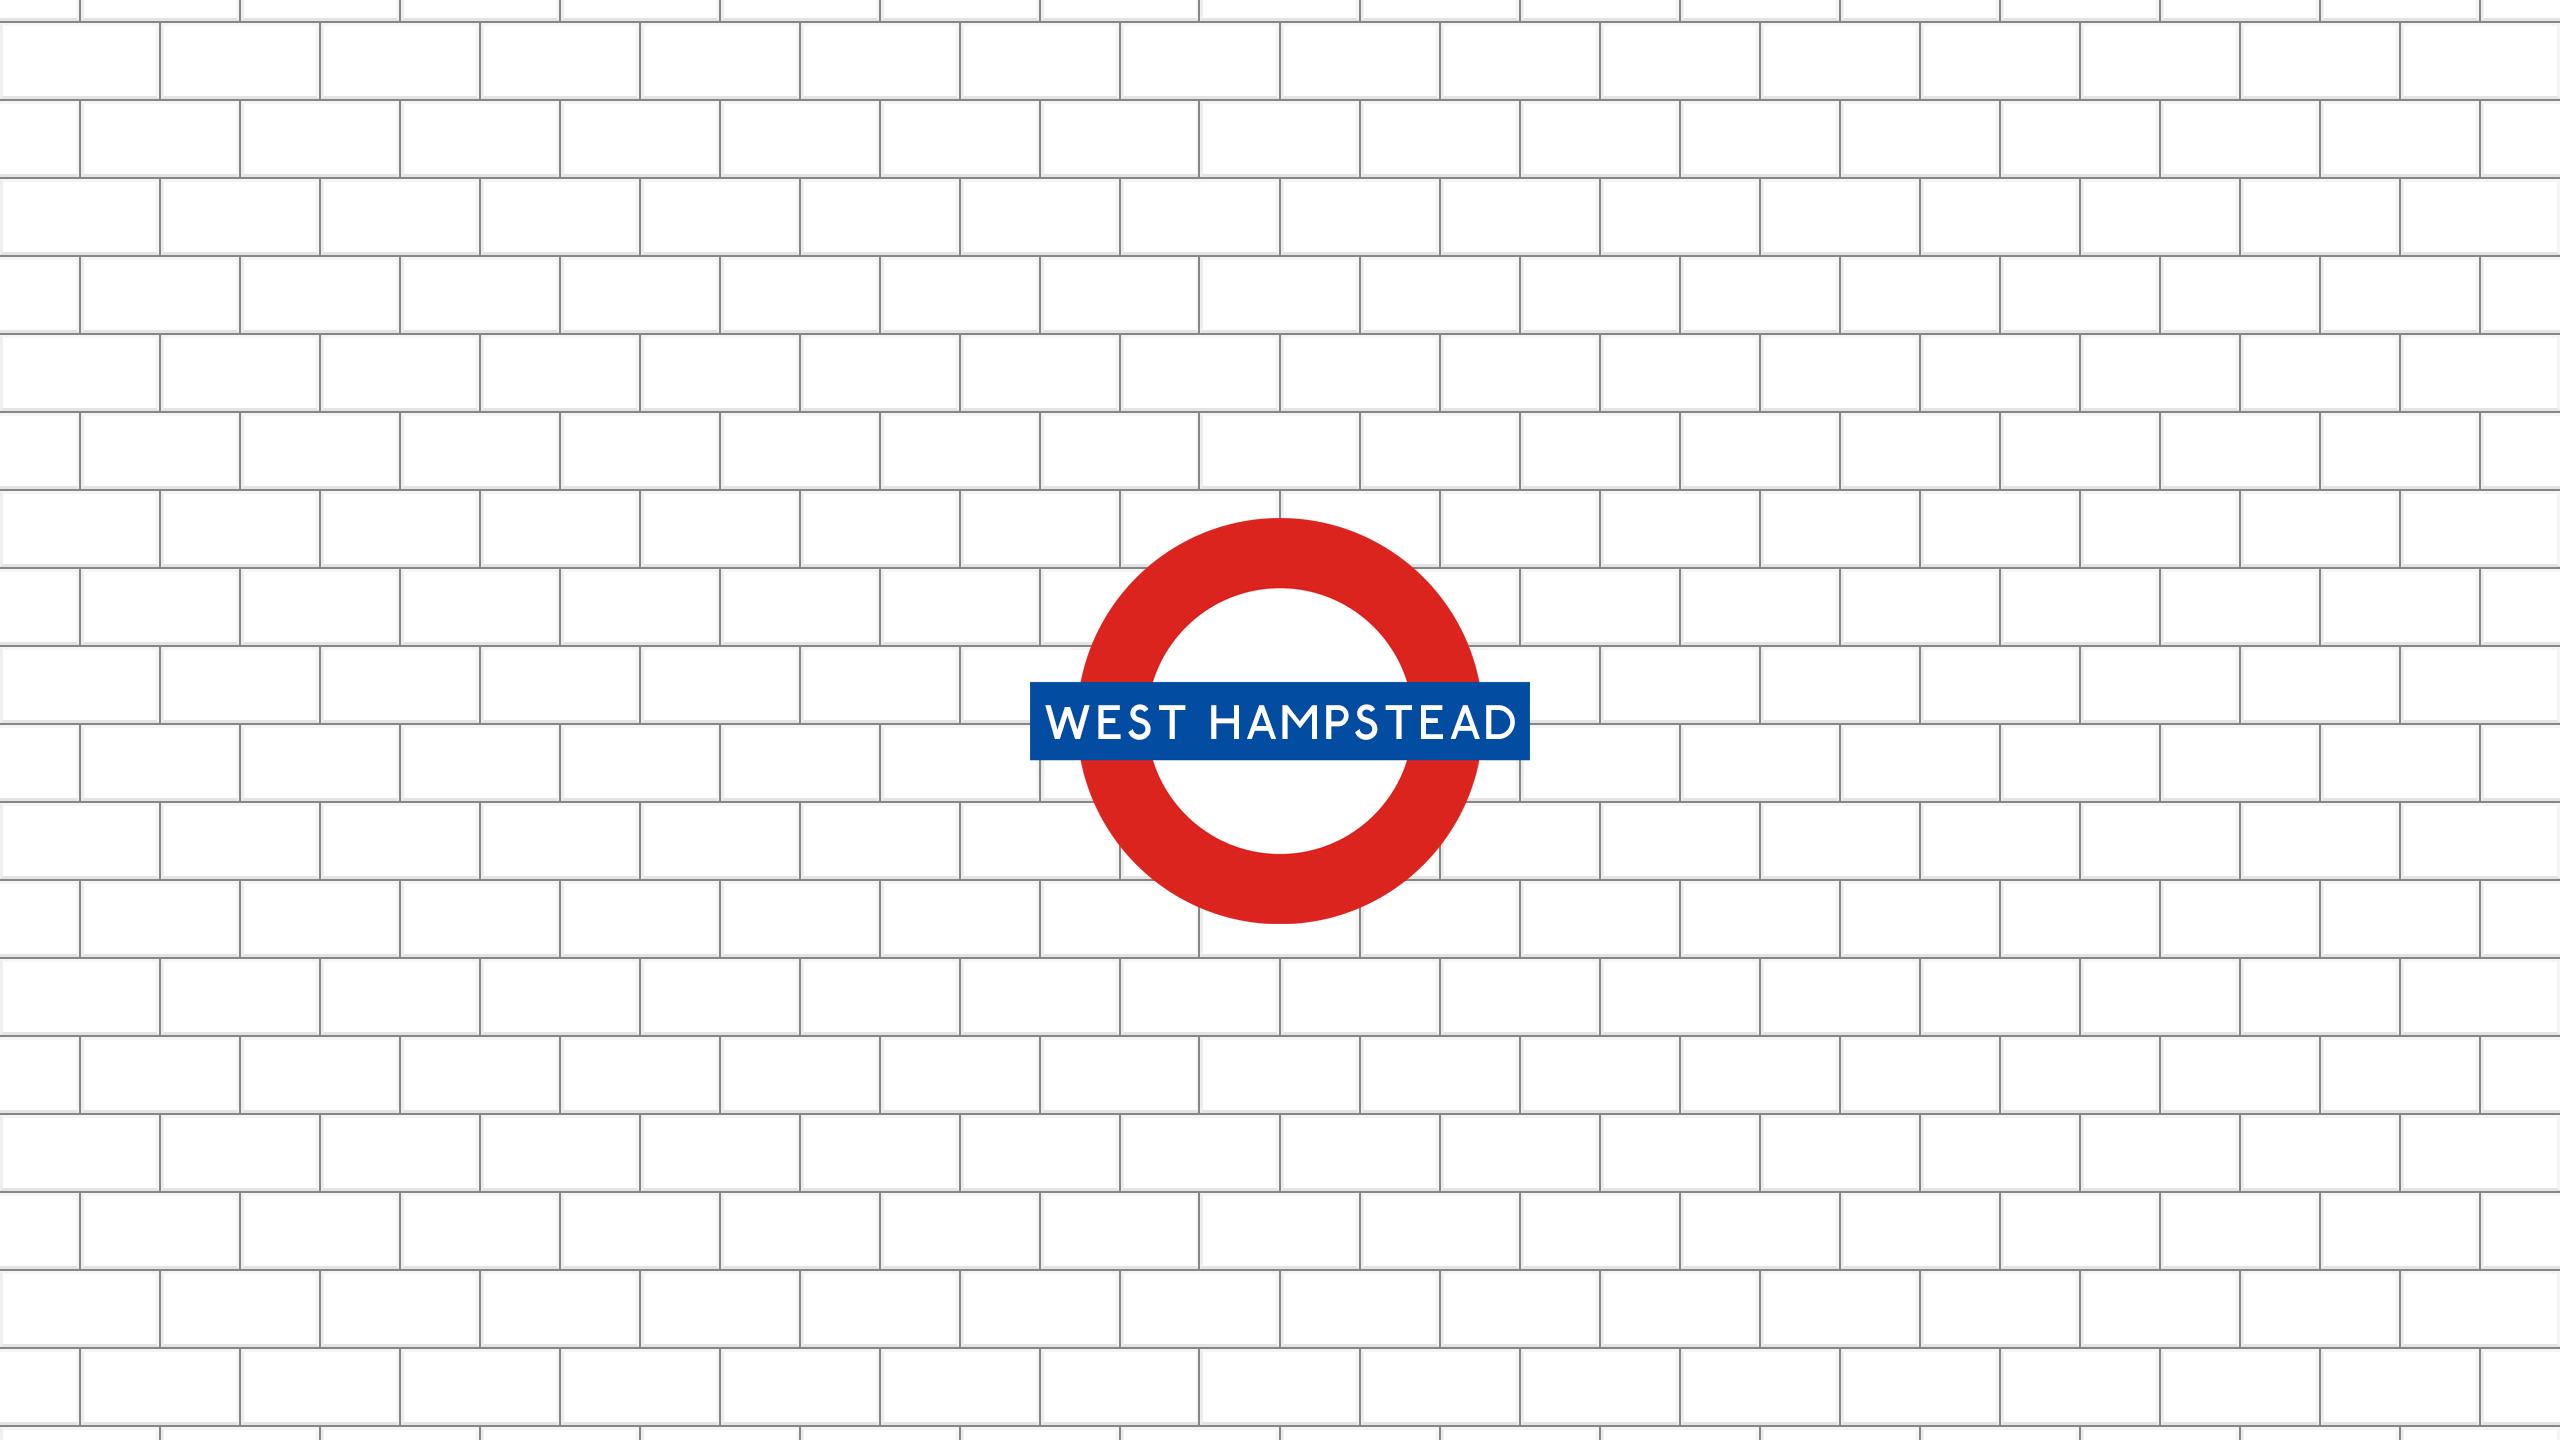 West Hampstead